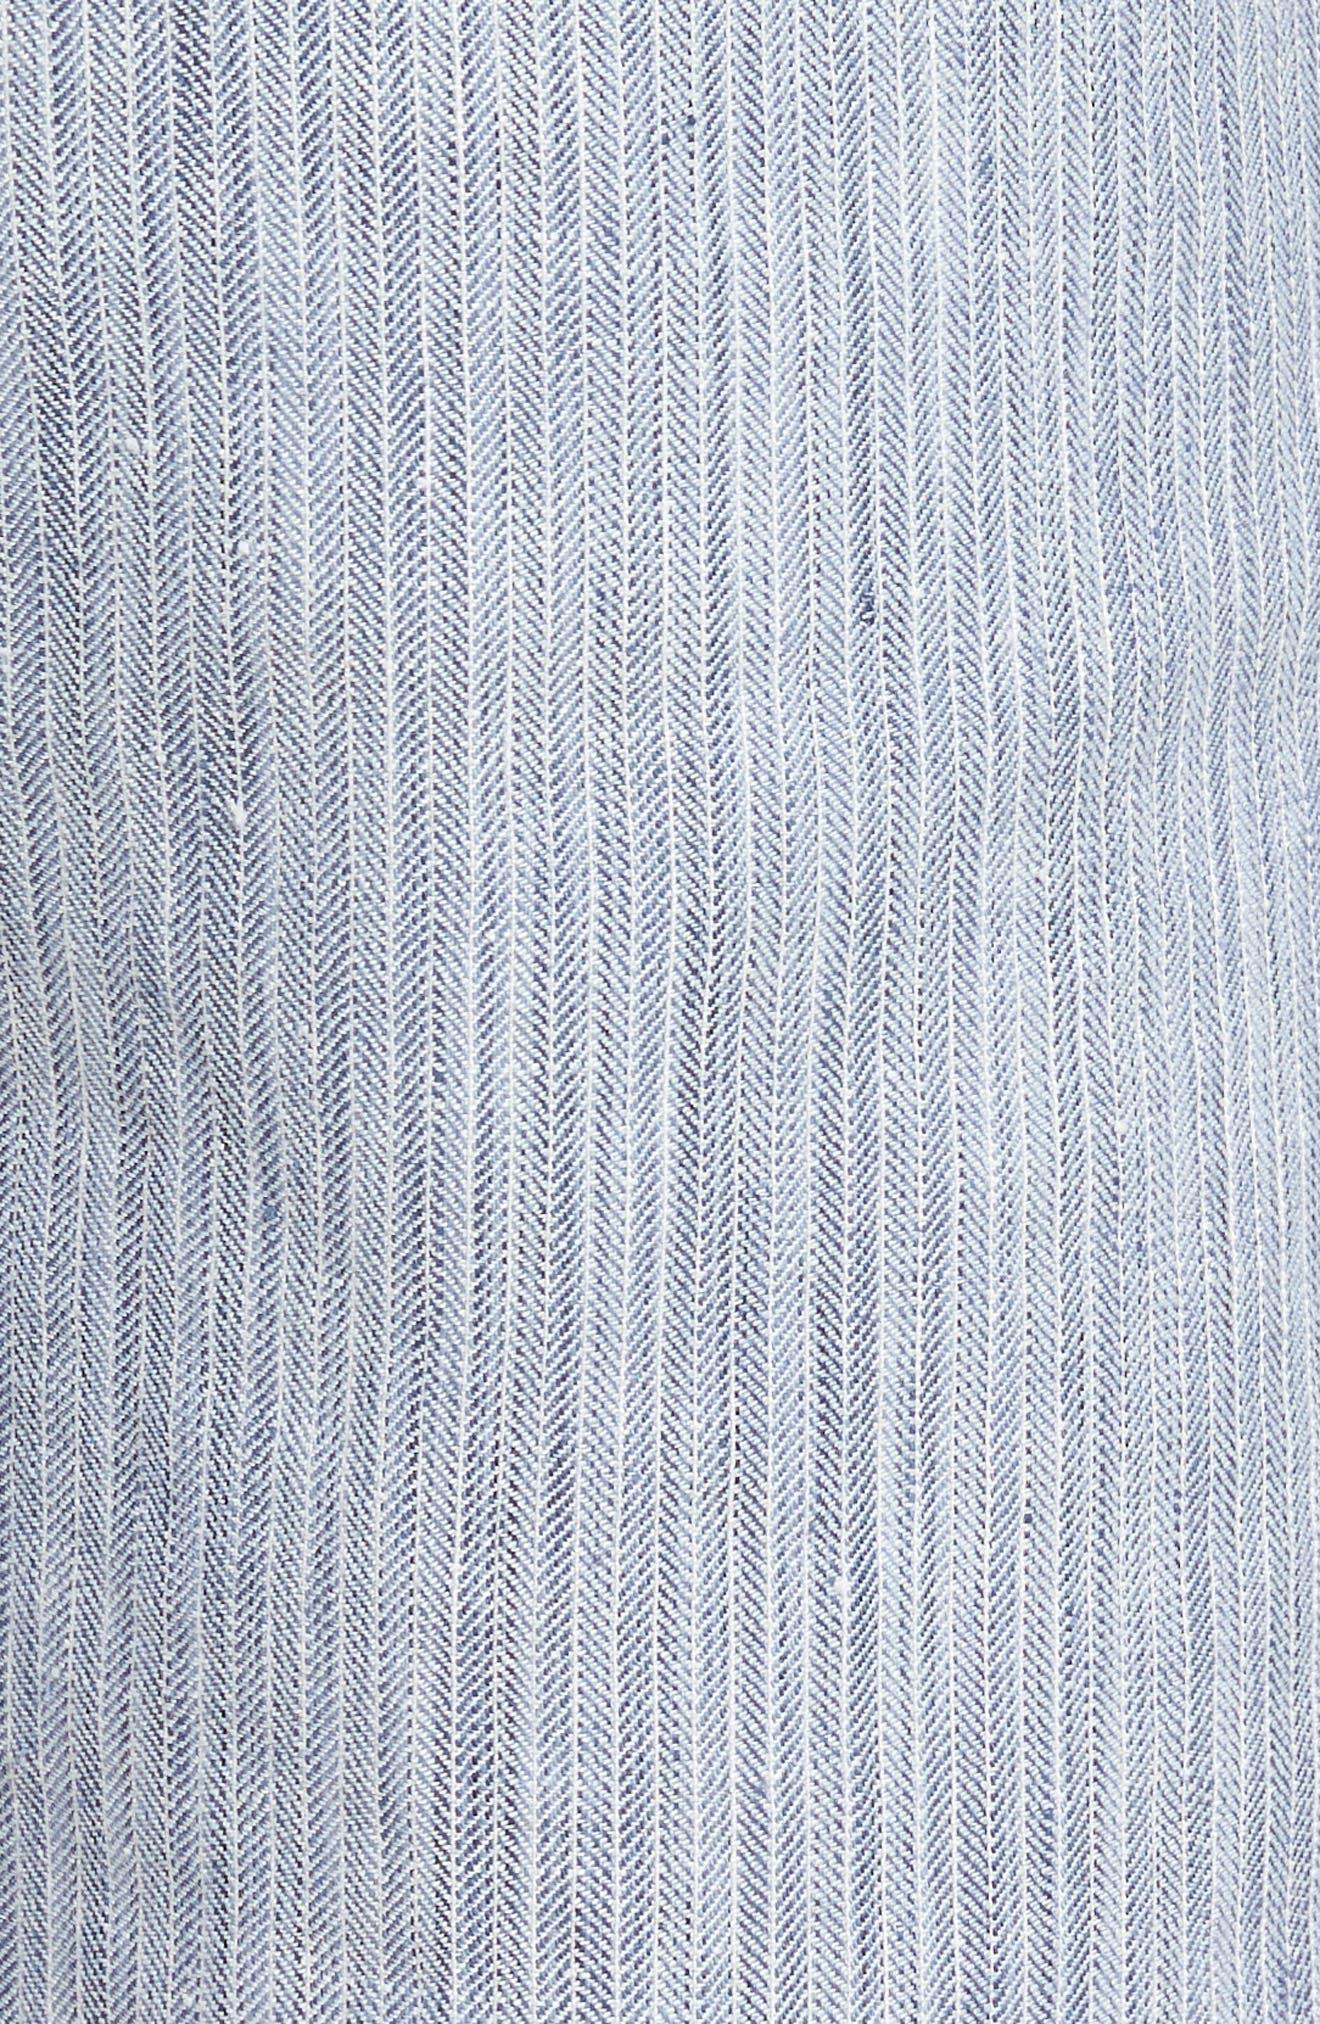 Harbor Herringbone Linen Blend Shorts,                             Alternate thumbnail 5, color,                             CHAMBRAY